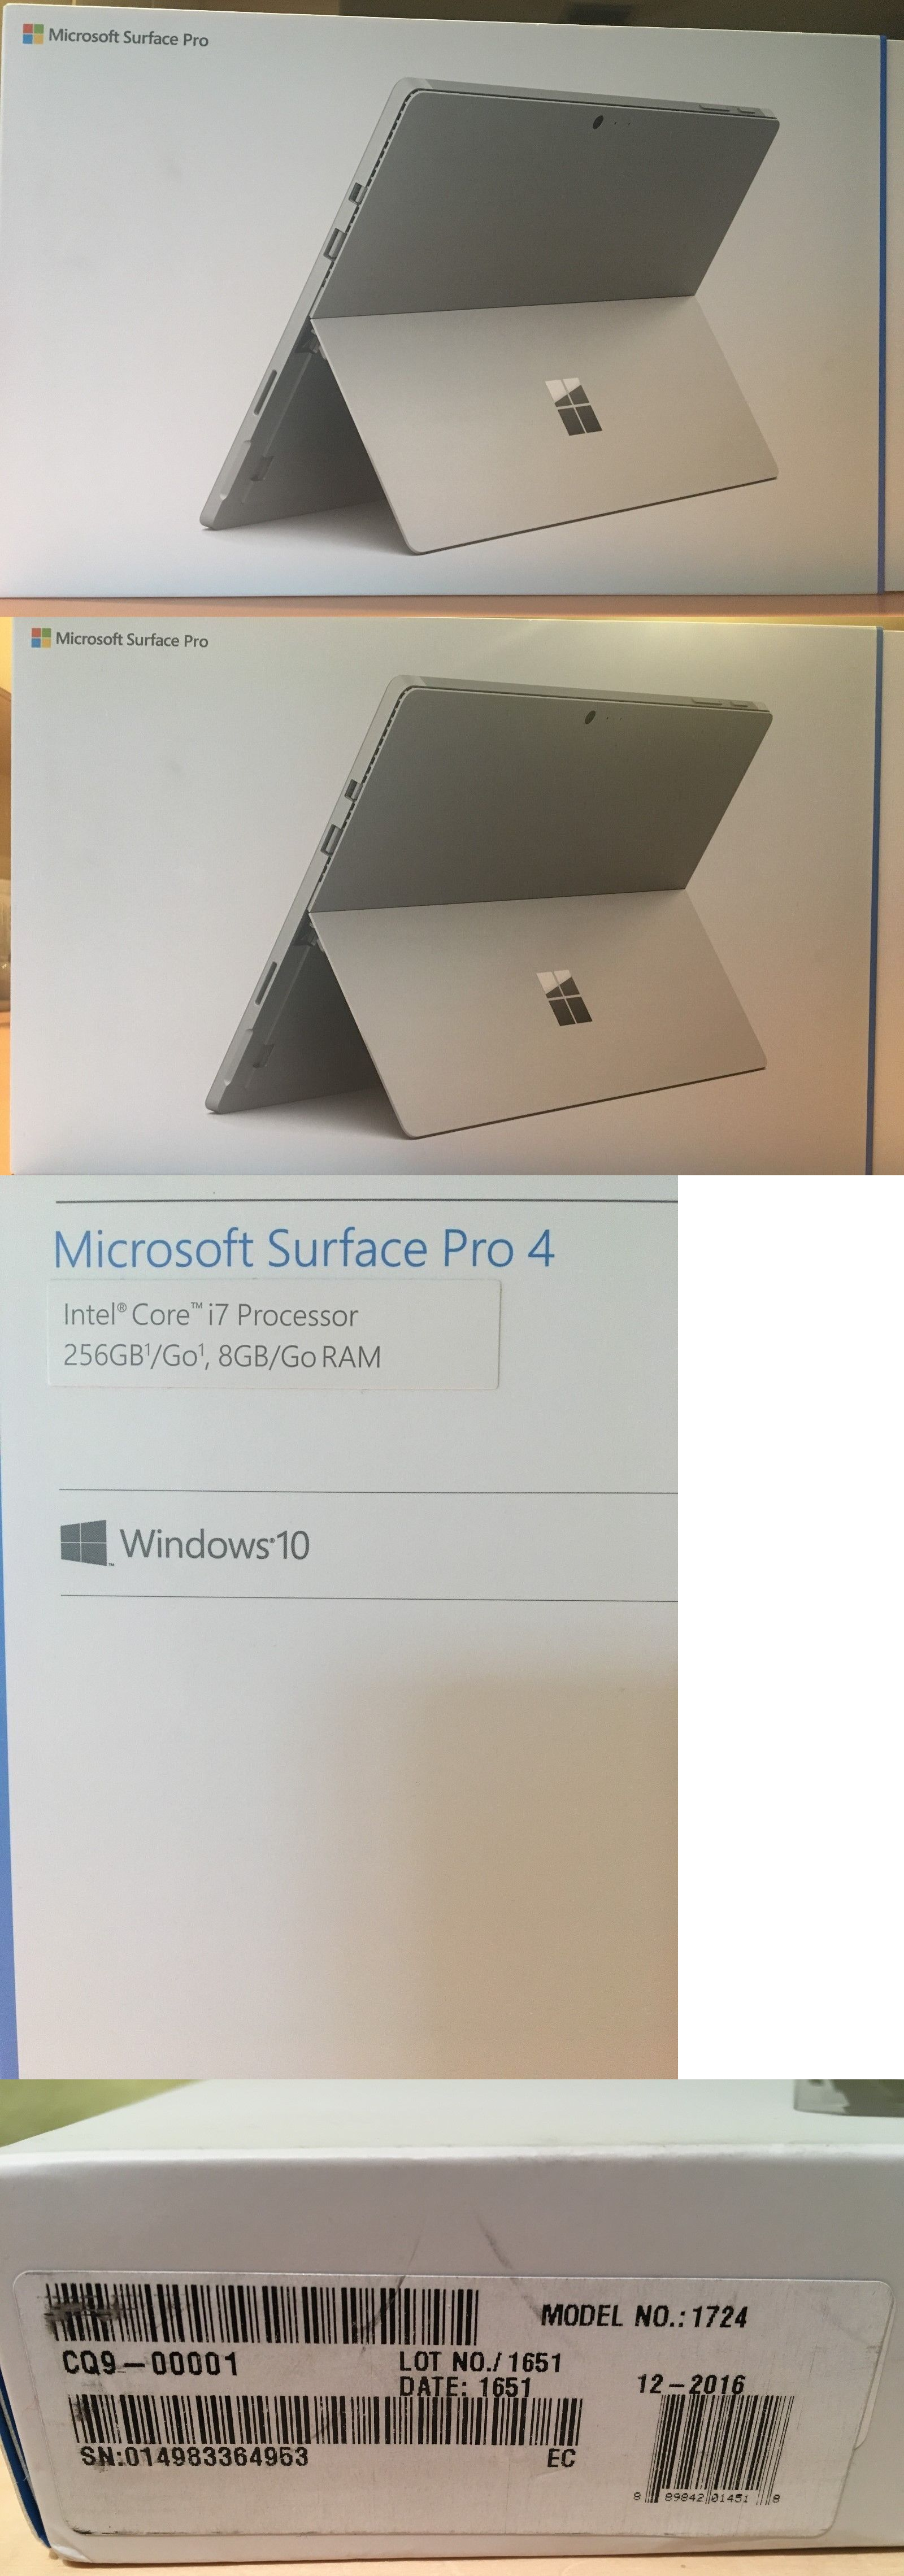 Notebook samsung expert x37 - Notebook Samsung Expert X37 38